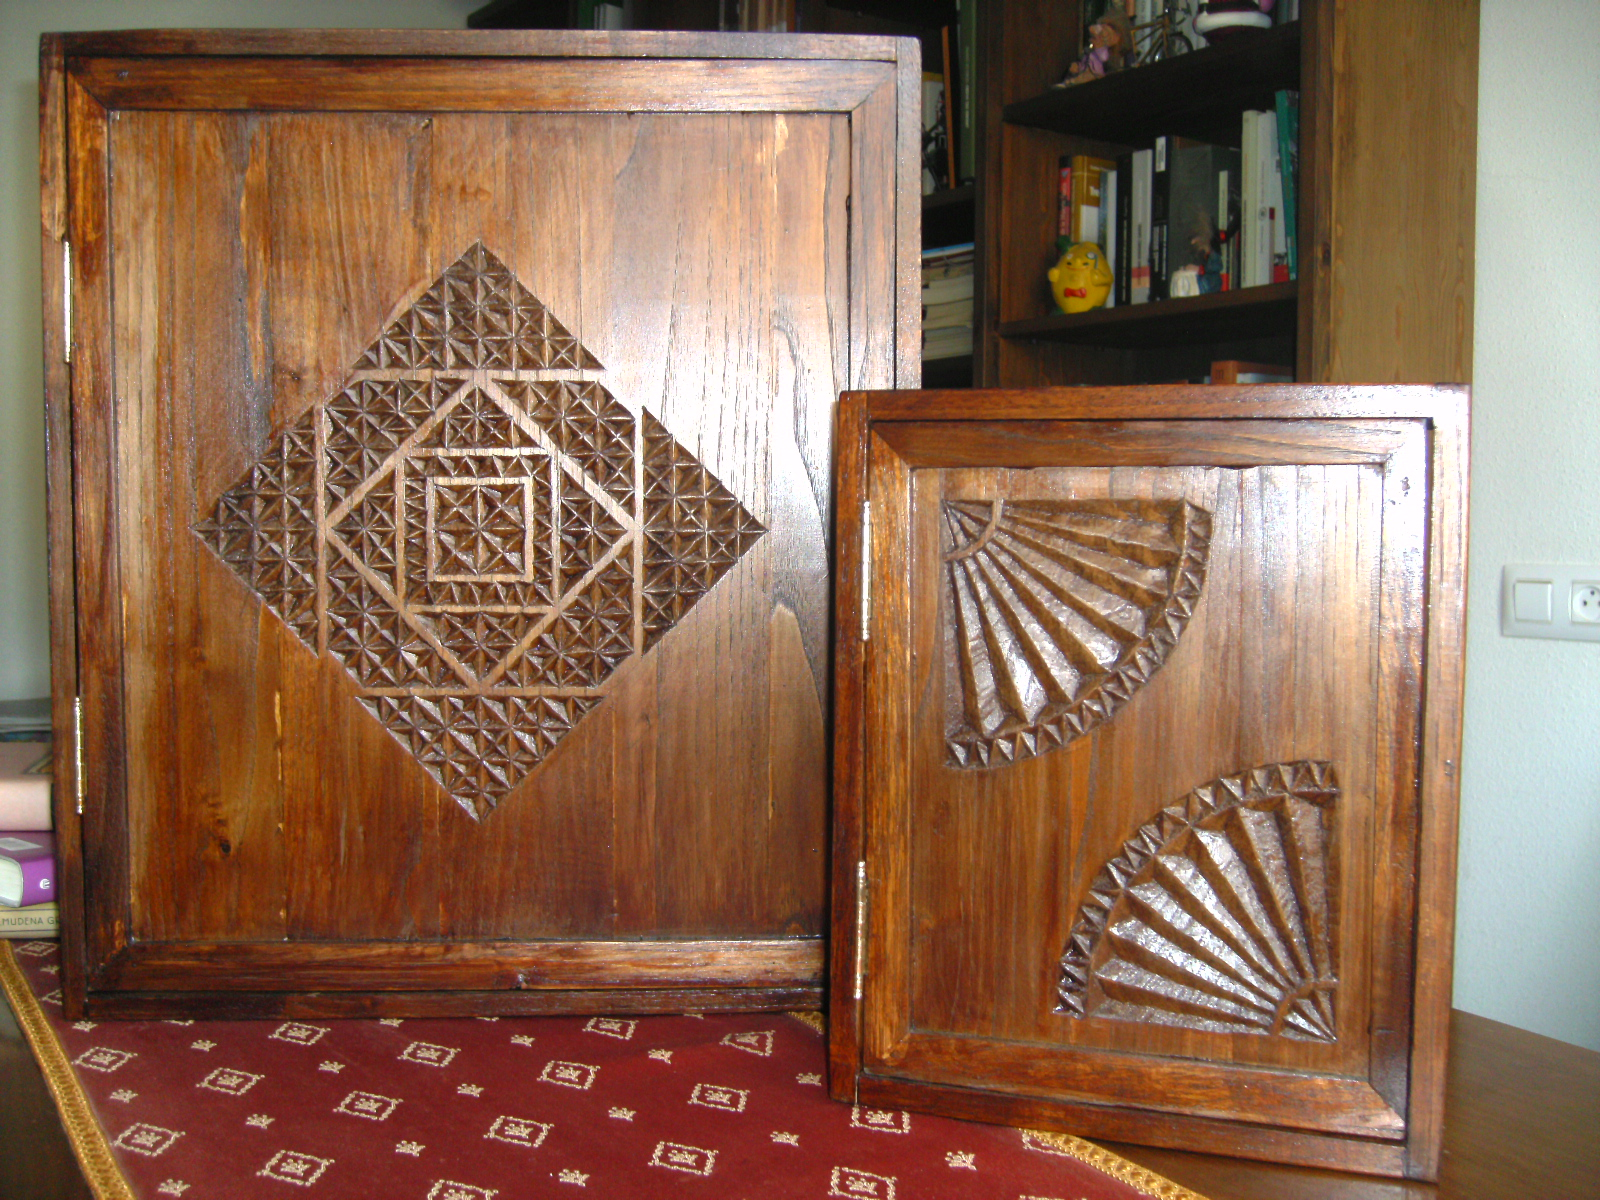 Decoraci n en madera para el hogar tapaluces de madera for Decoracion en madera para el hogar